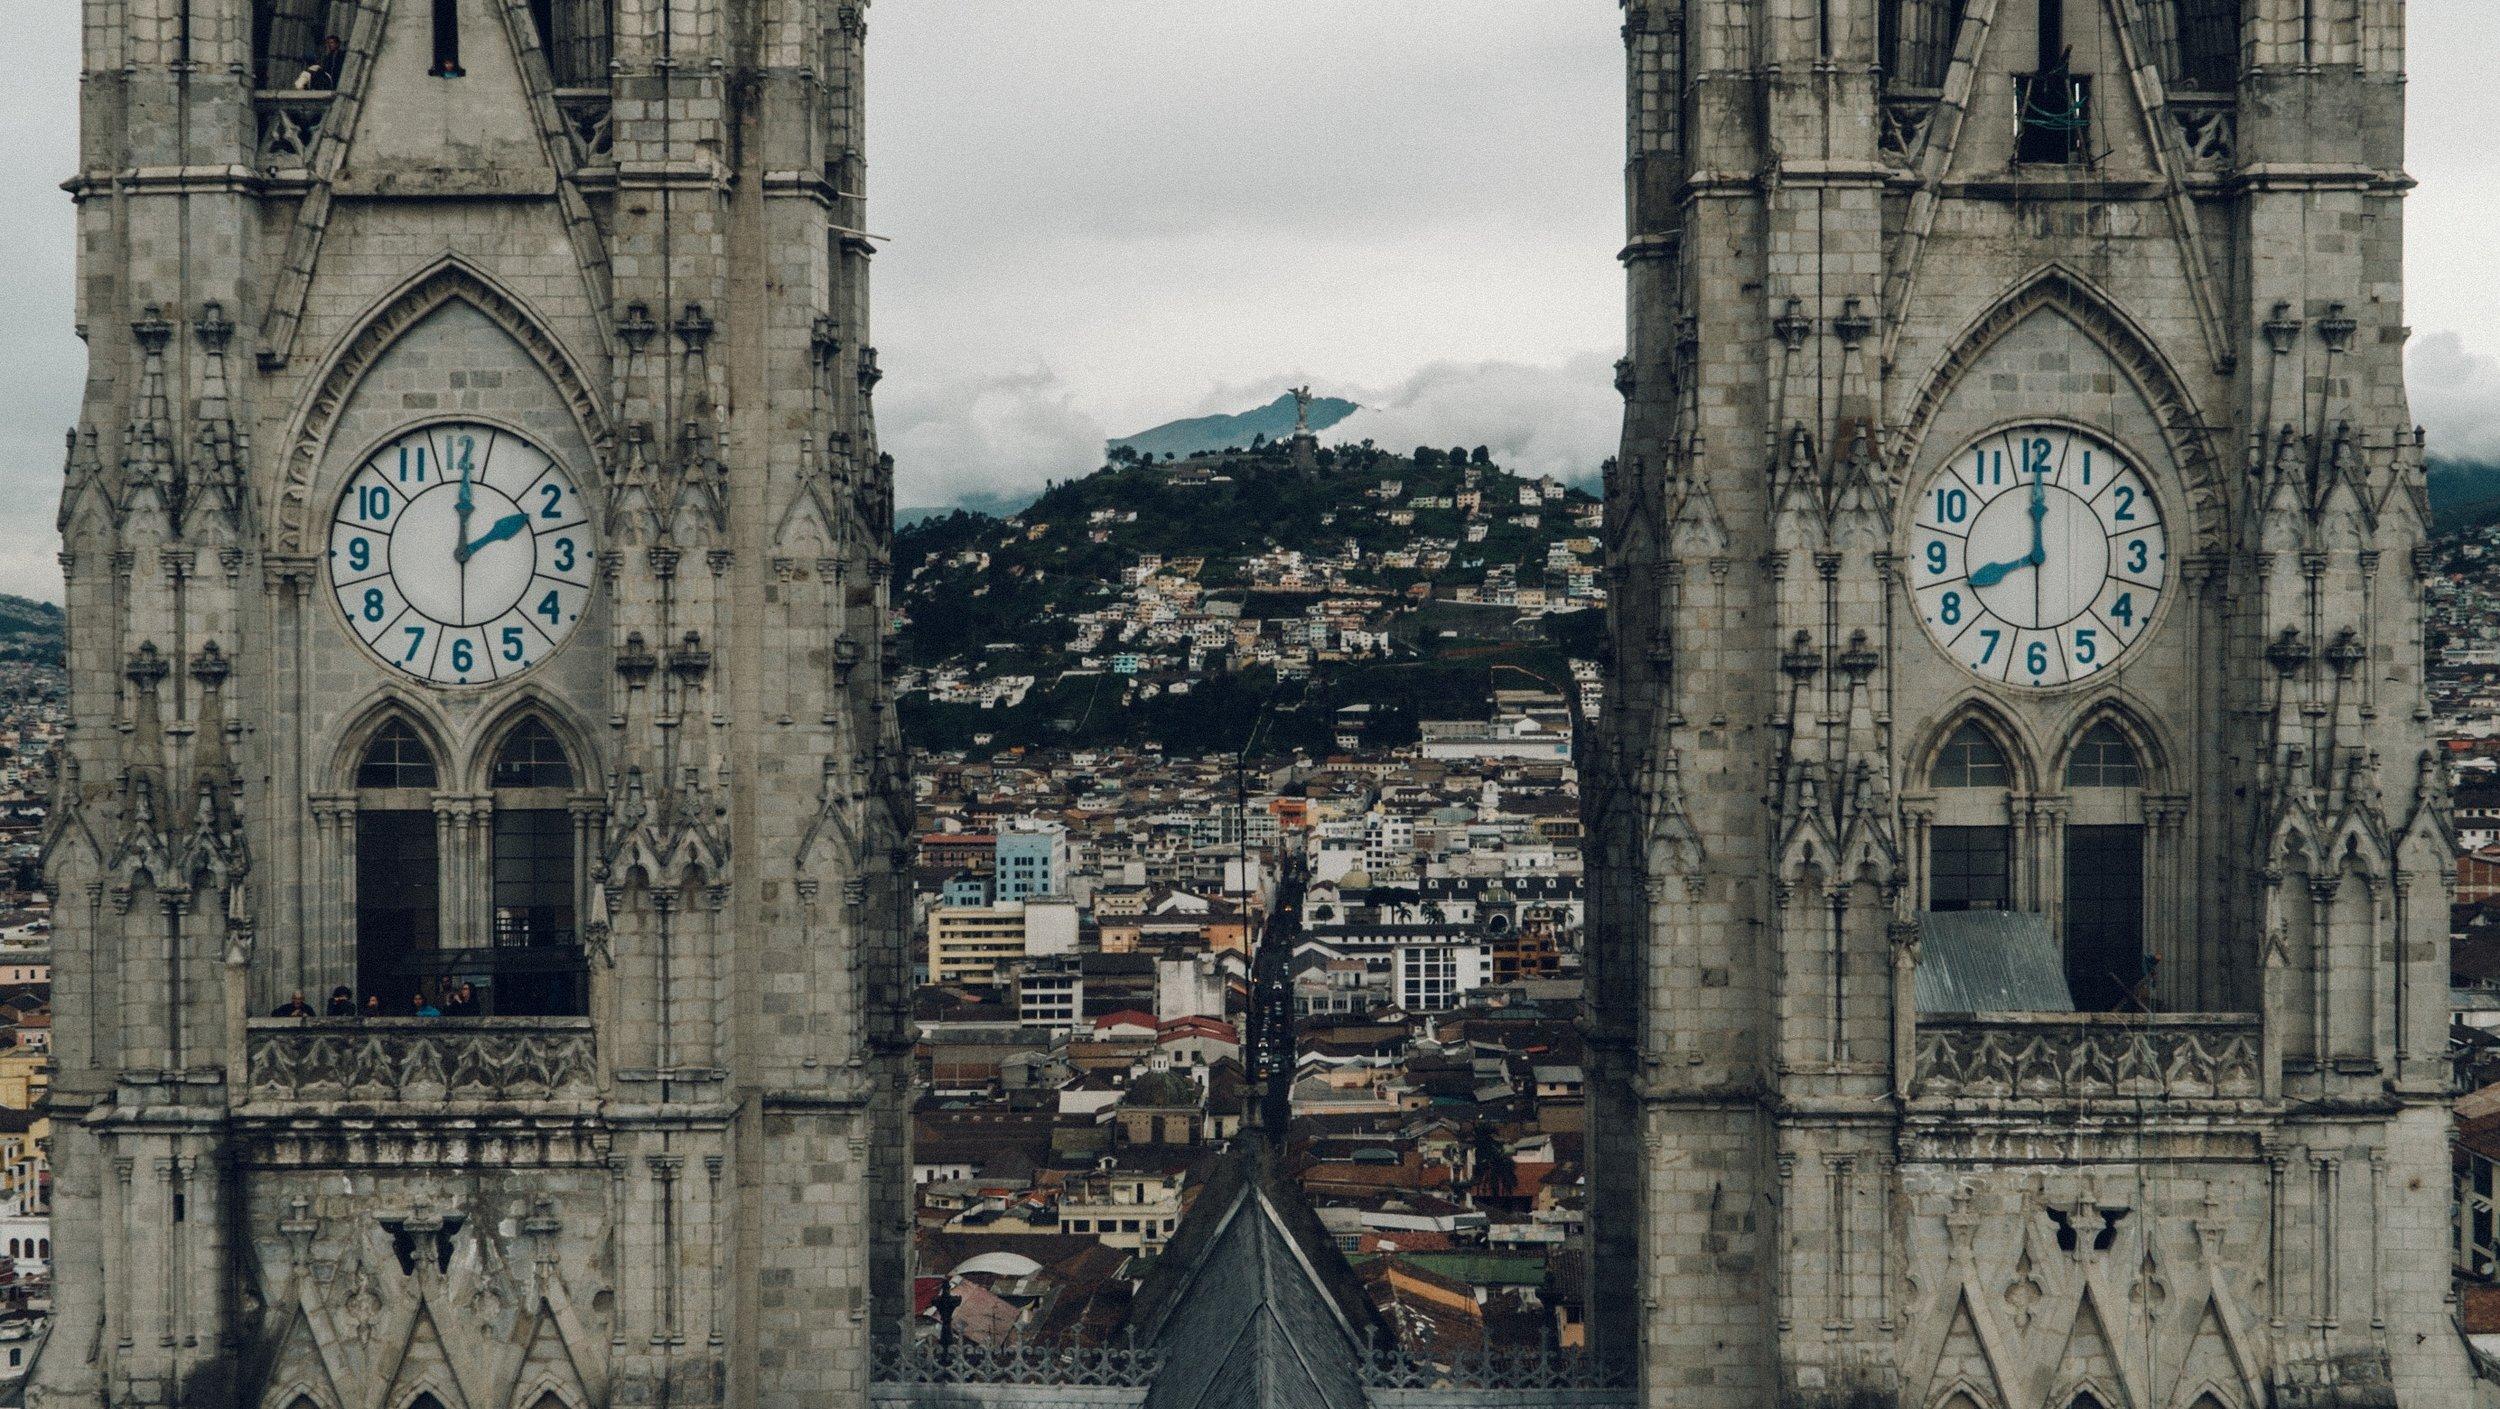 Basilica de Voto Nacional, Quito  Photo by  Chandler Hilken  on  Unsplash